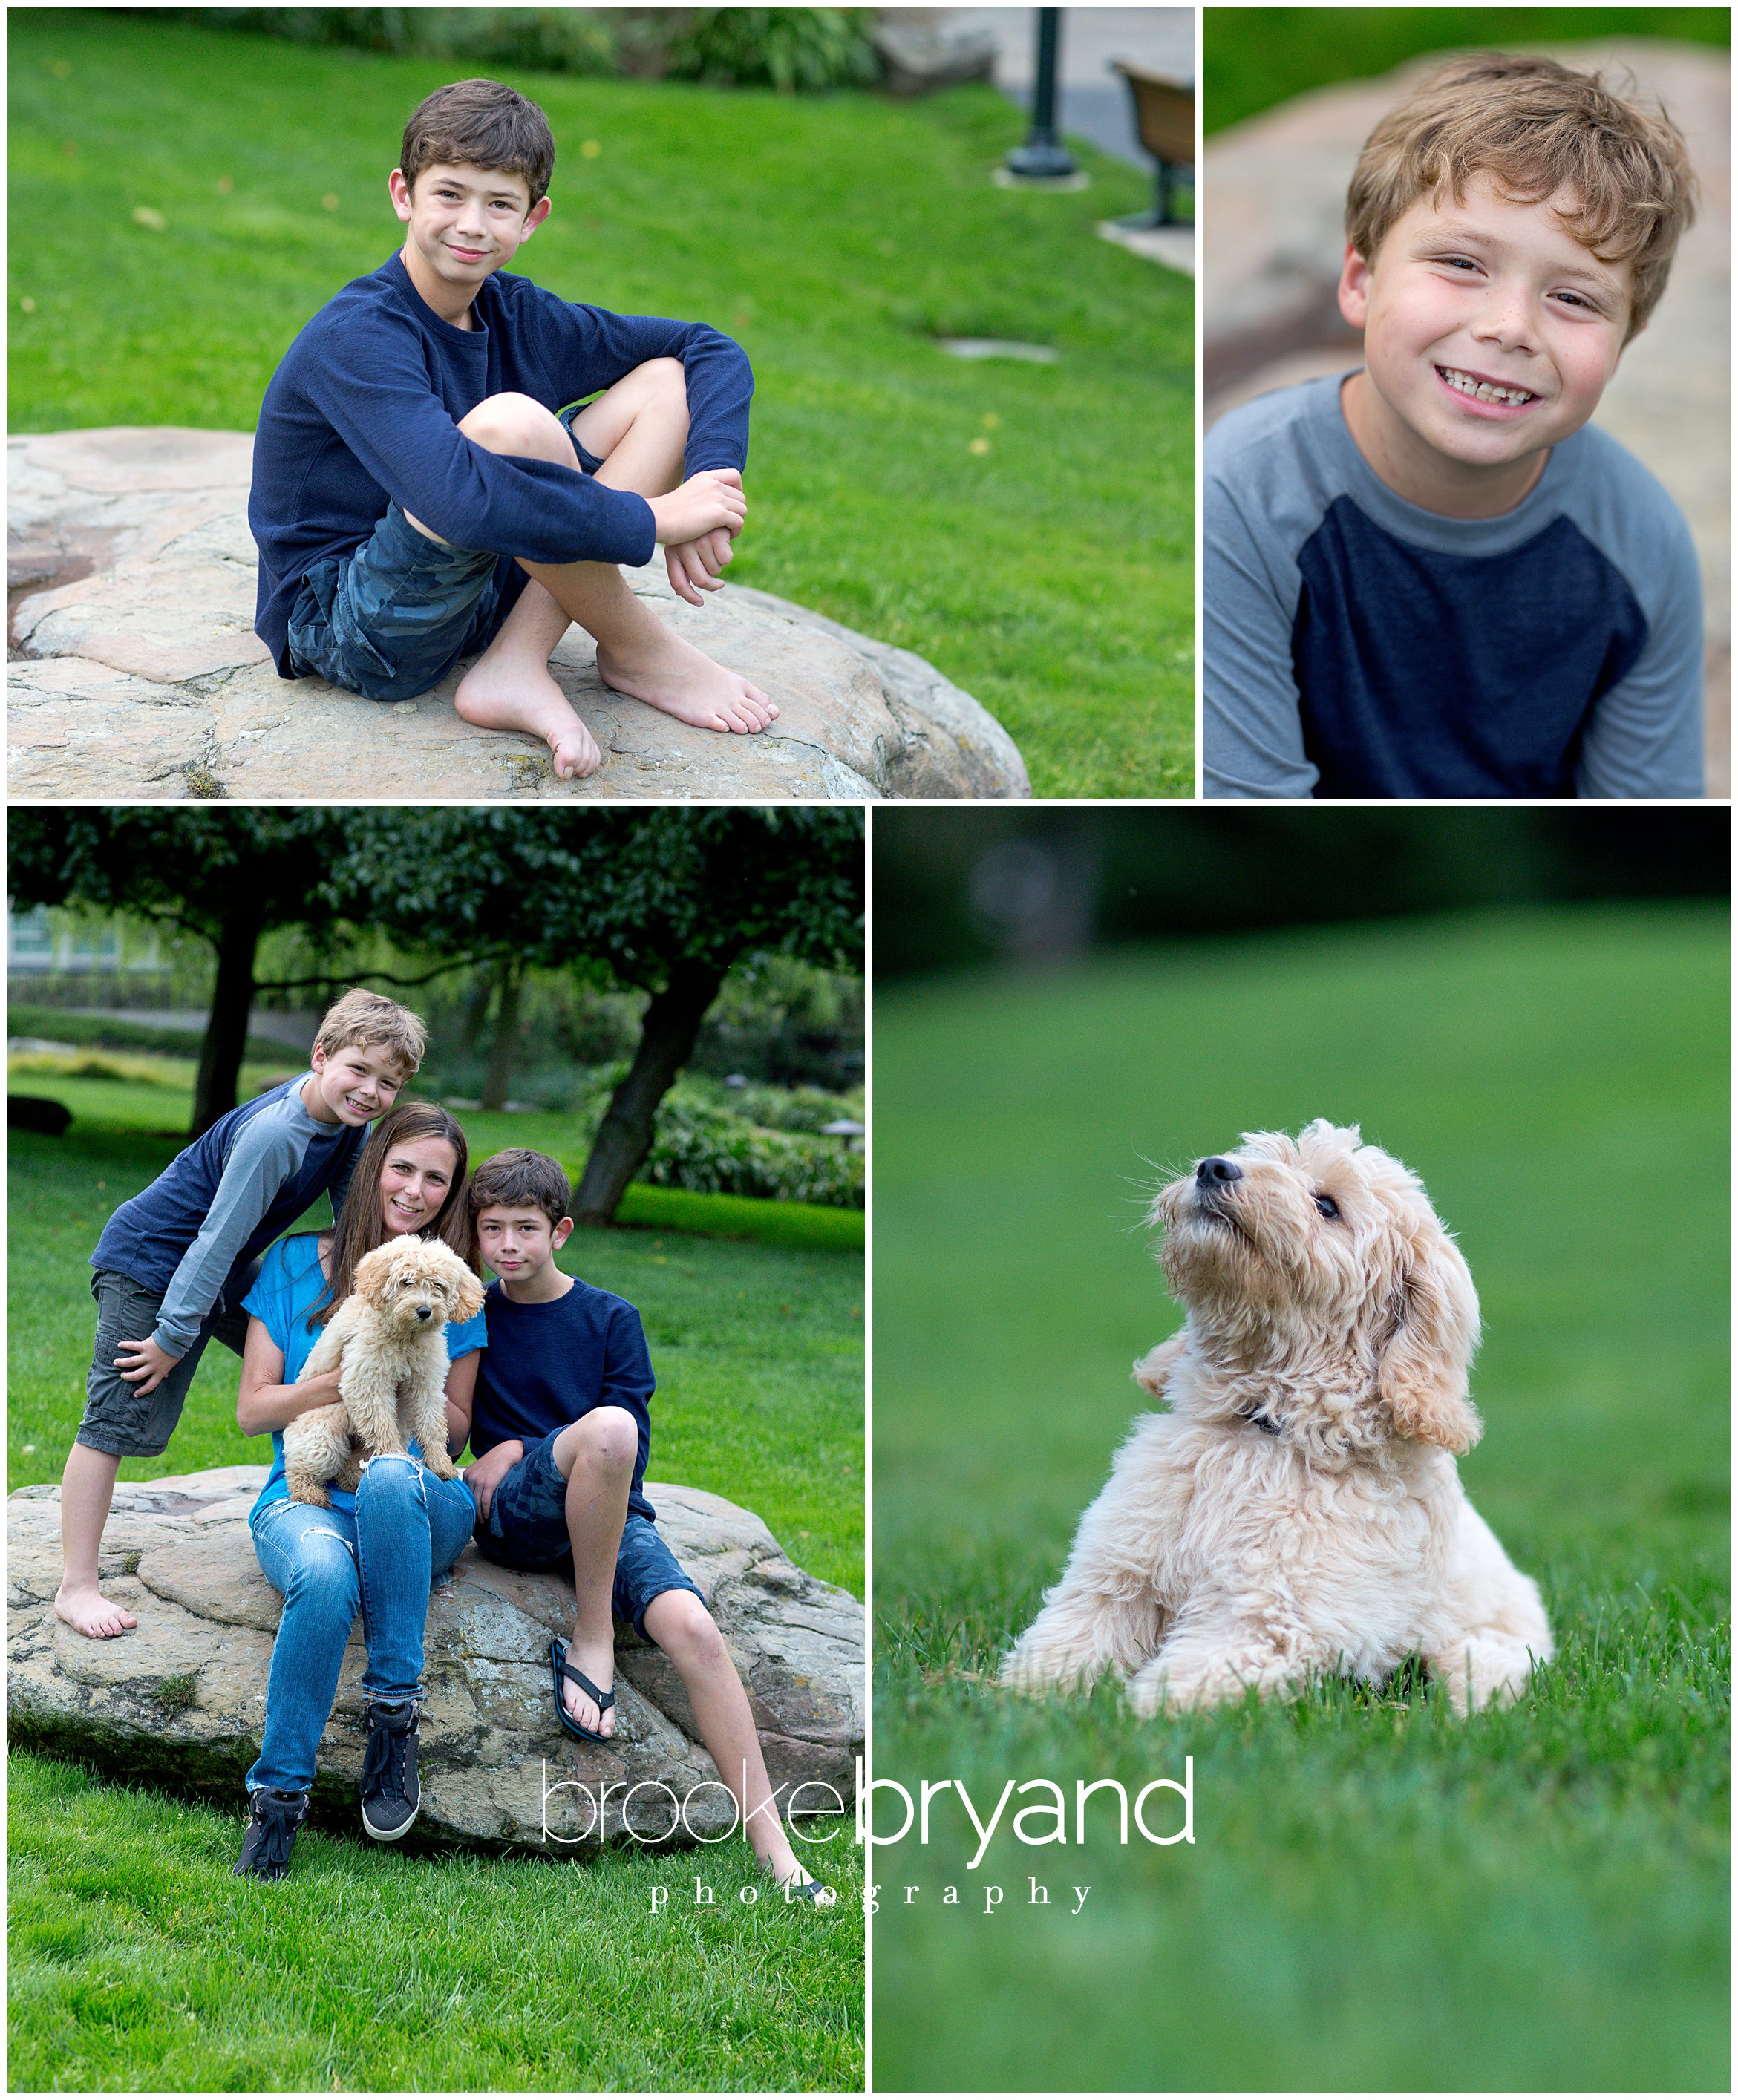 09.2014-Goodies-BBP_8647_San-Francisco-Family-Photos-Brooke-Bryand-Photography.jpg